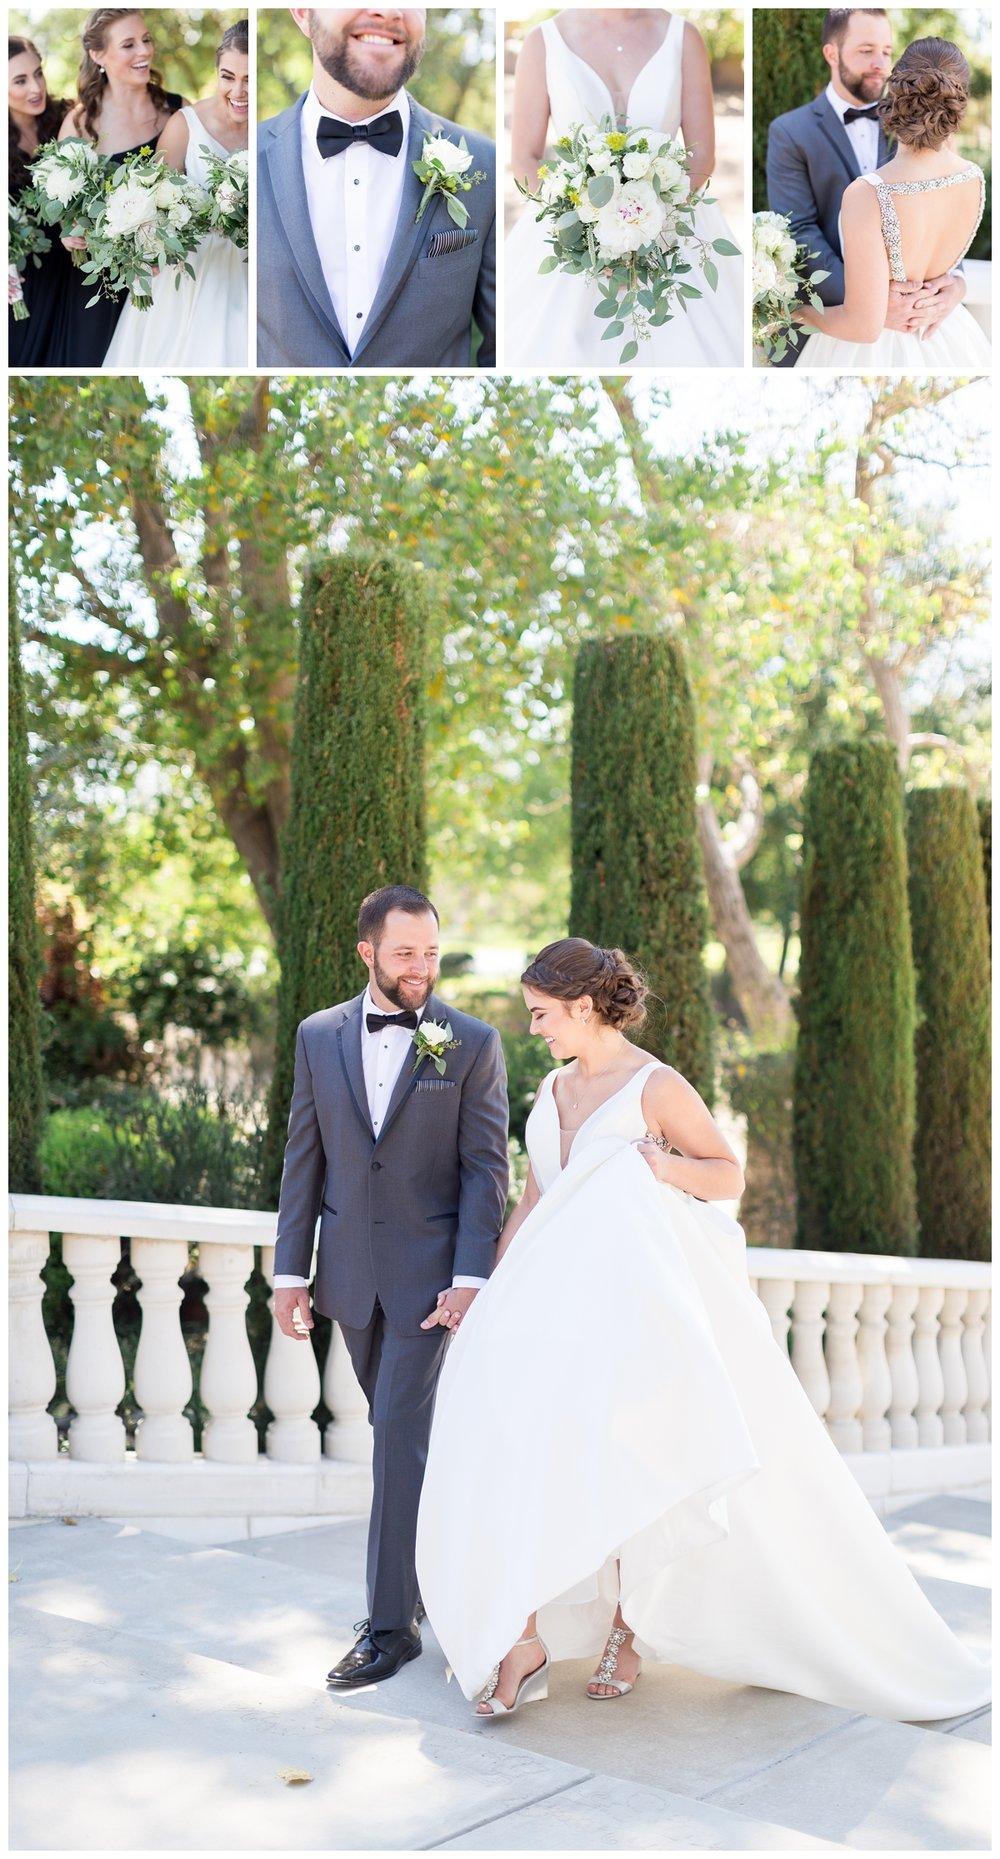 Viaggio-Winery-Wedding-Photographer_5513.jpg